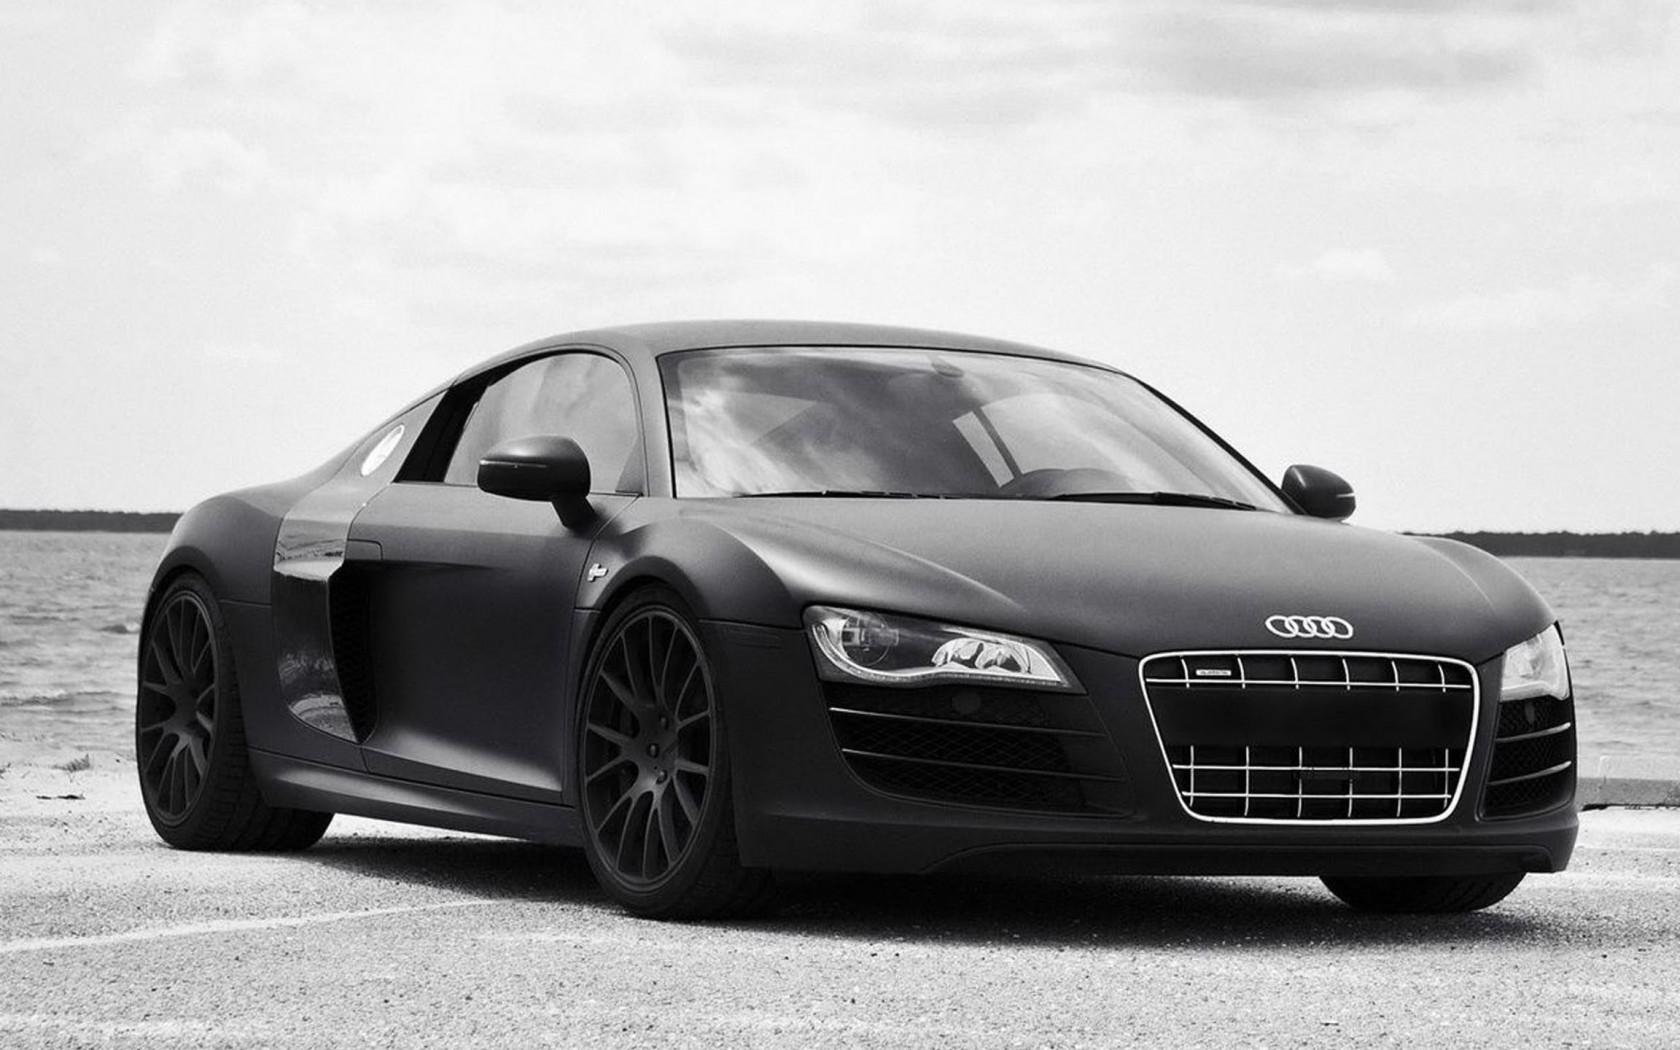 Audi R8 Awesome Photo 1680x1050 Wallpaper Teahub Io